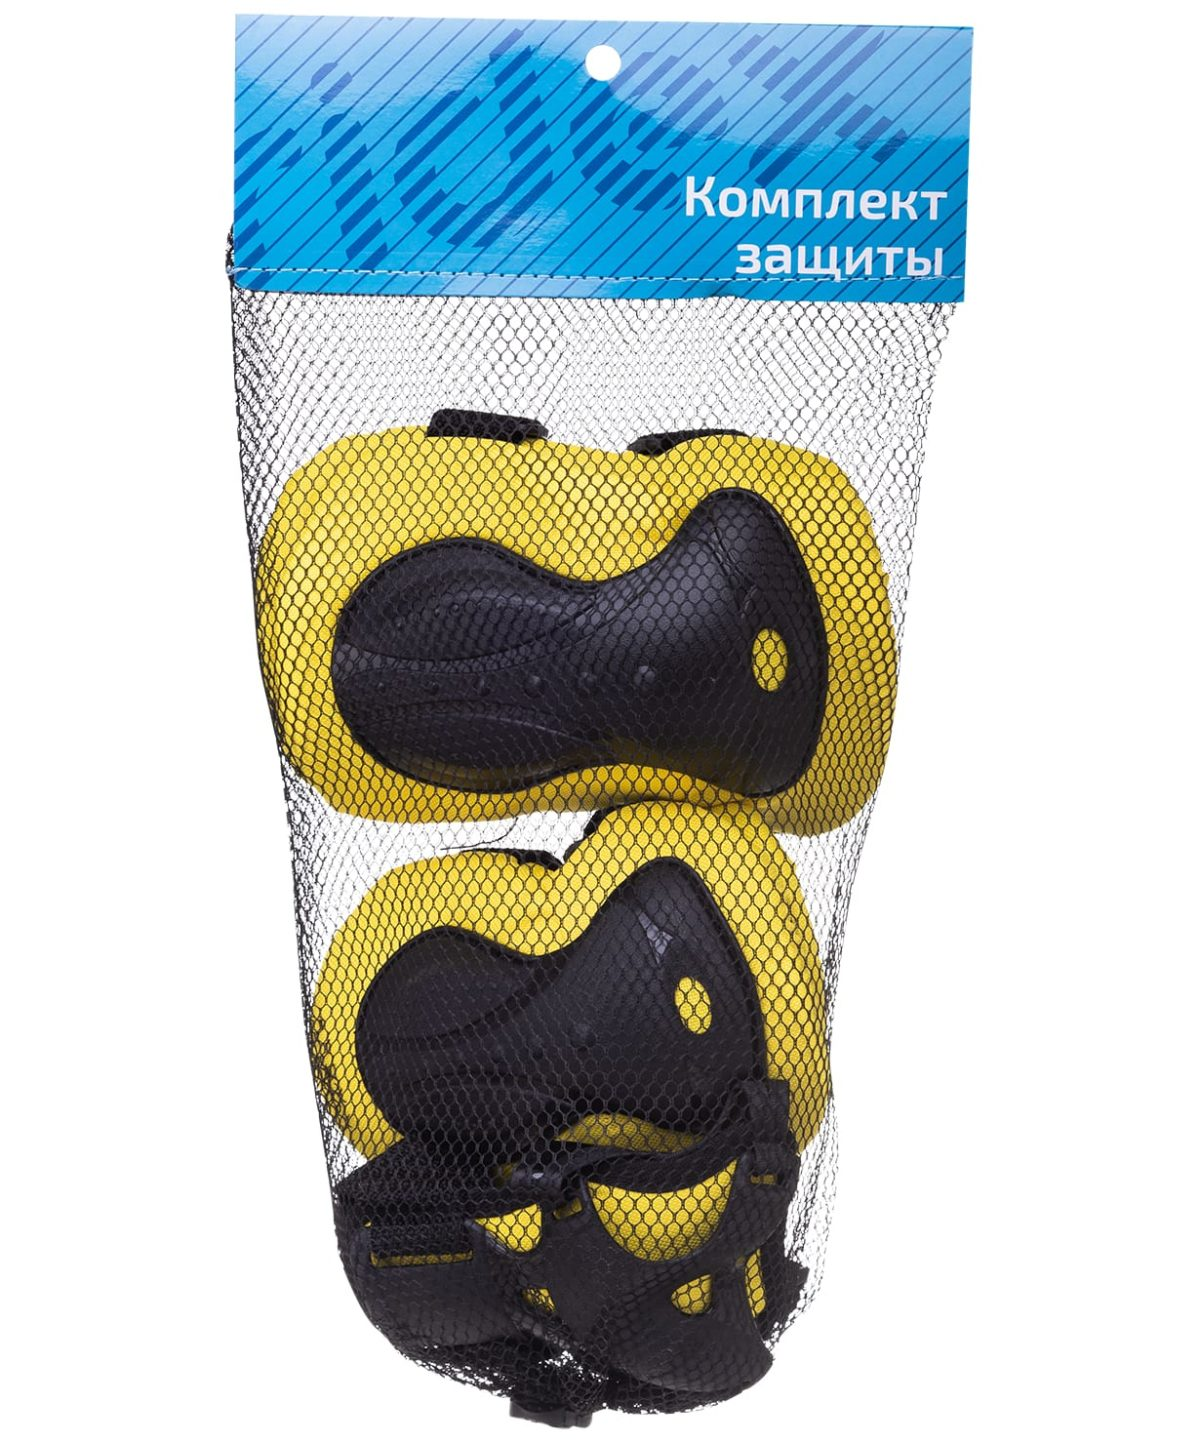 RIDEX Комплект защиты Enyy: жёлтый - 6